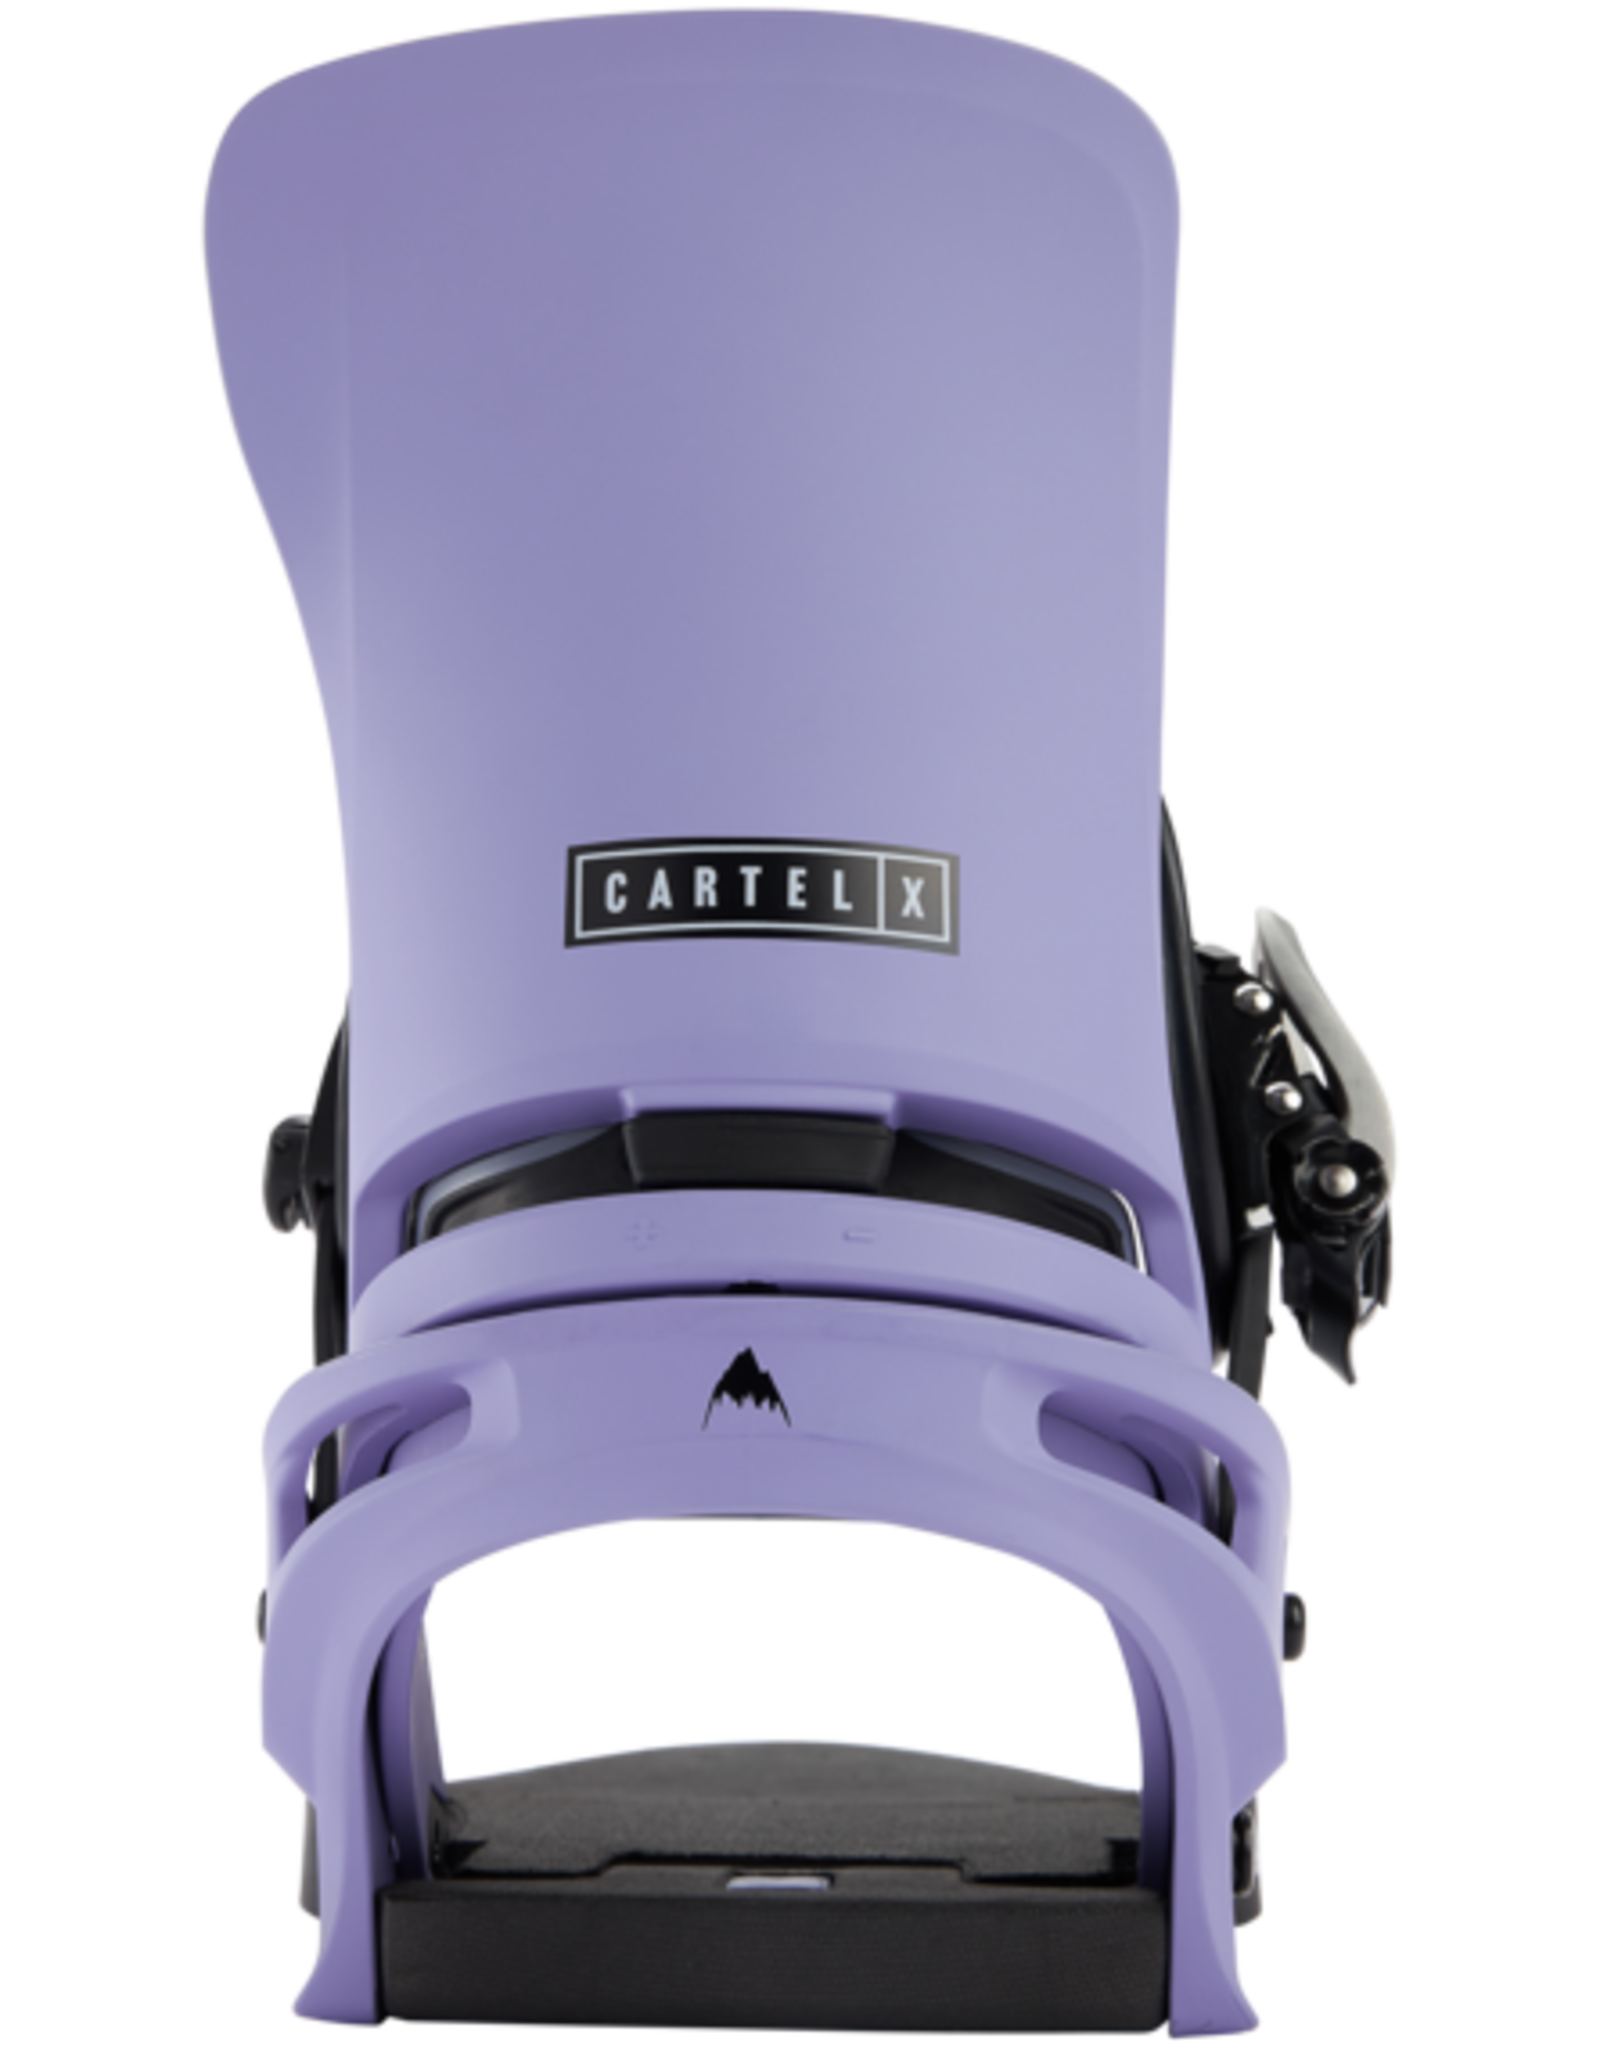 BURTON 2022 CARTEL X REFLEX